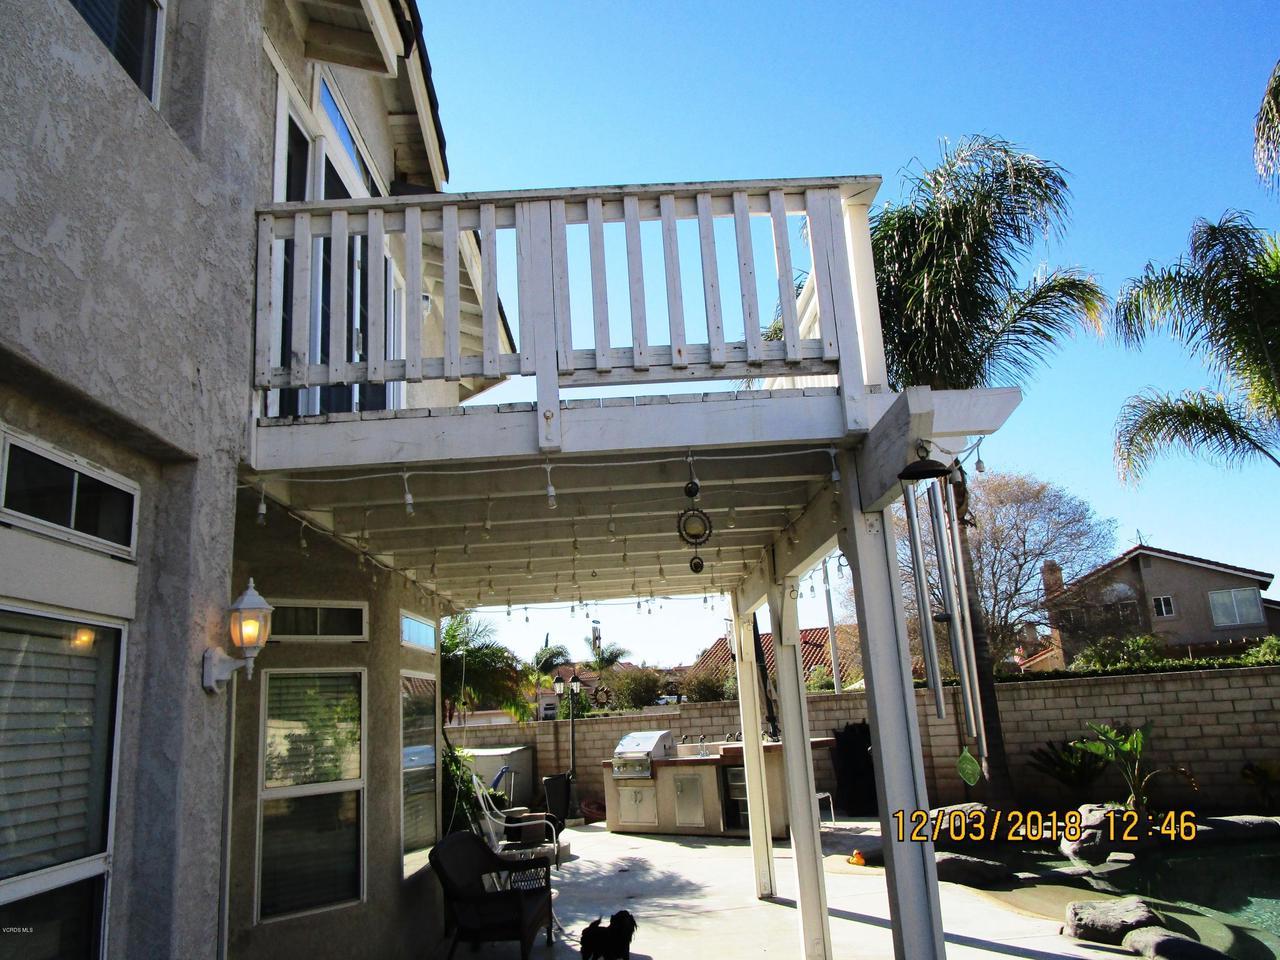 1063 MEADOWLARK, Fillmore, CA 93015 - patio cover